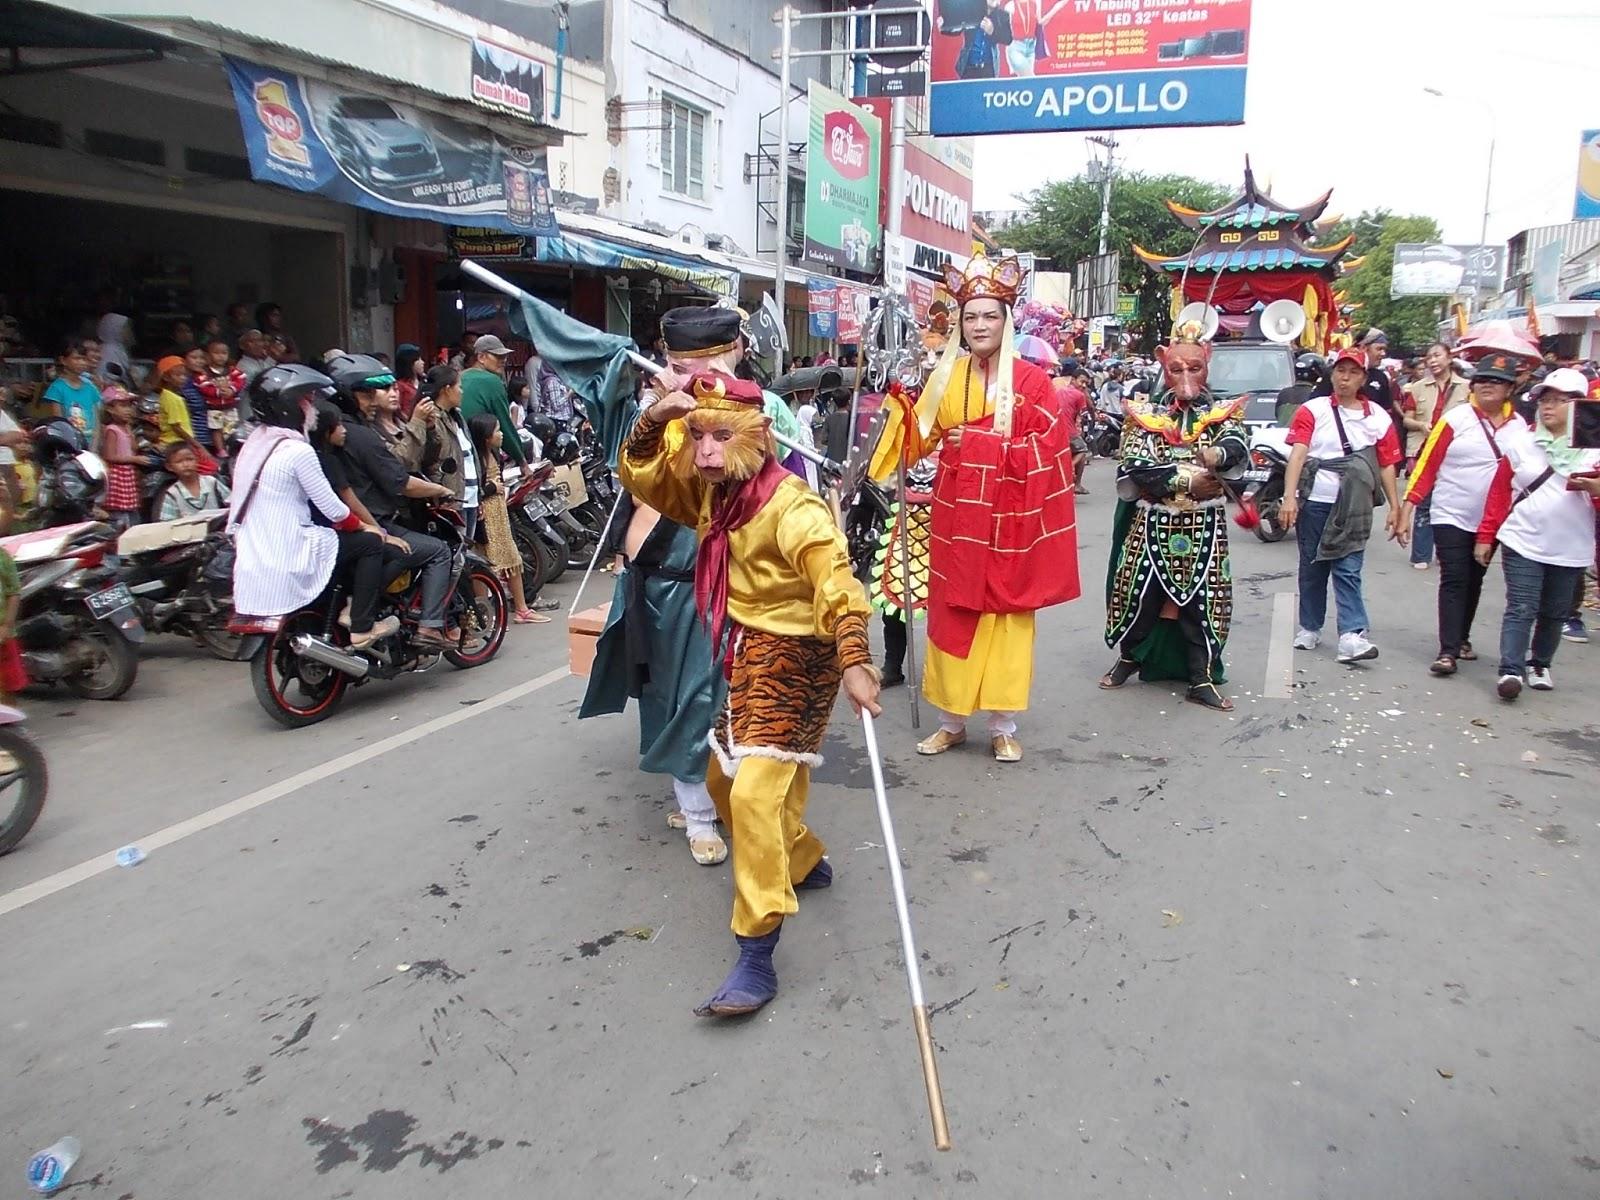 Pekalongan Potret Kota Multi Etnis Yang Damai Kaskus